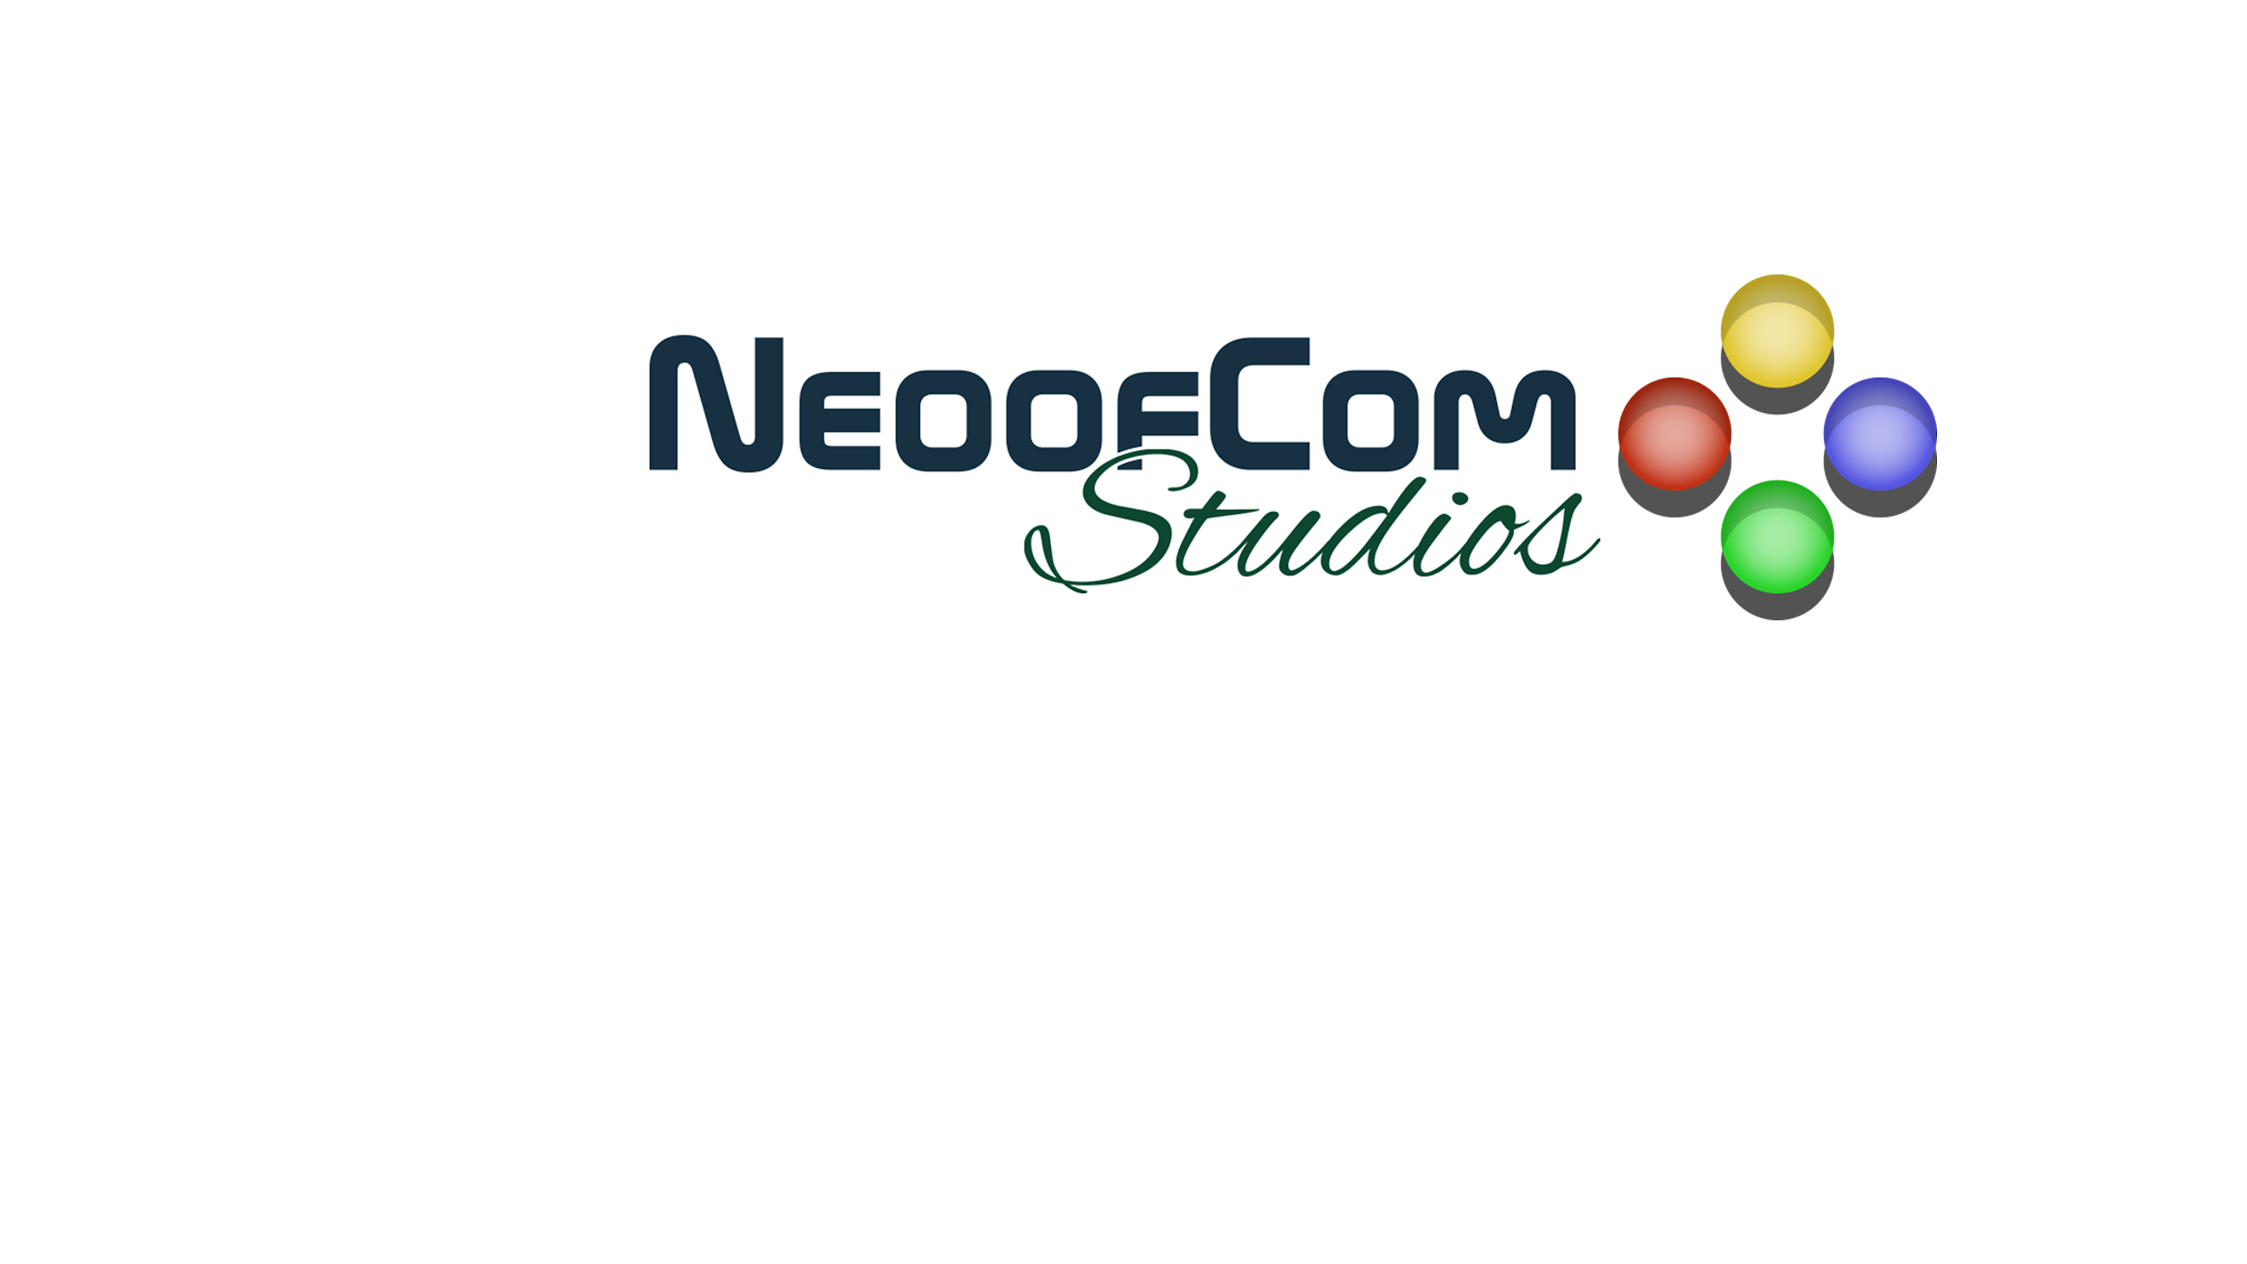 Neoofcom Studios